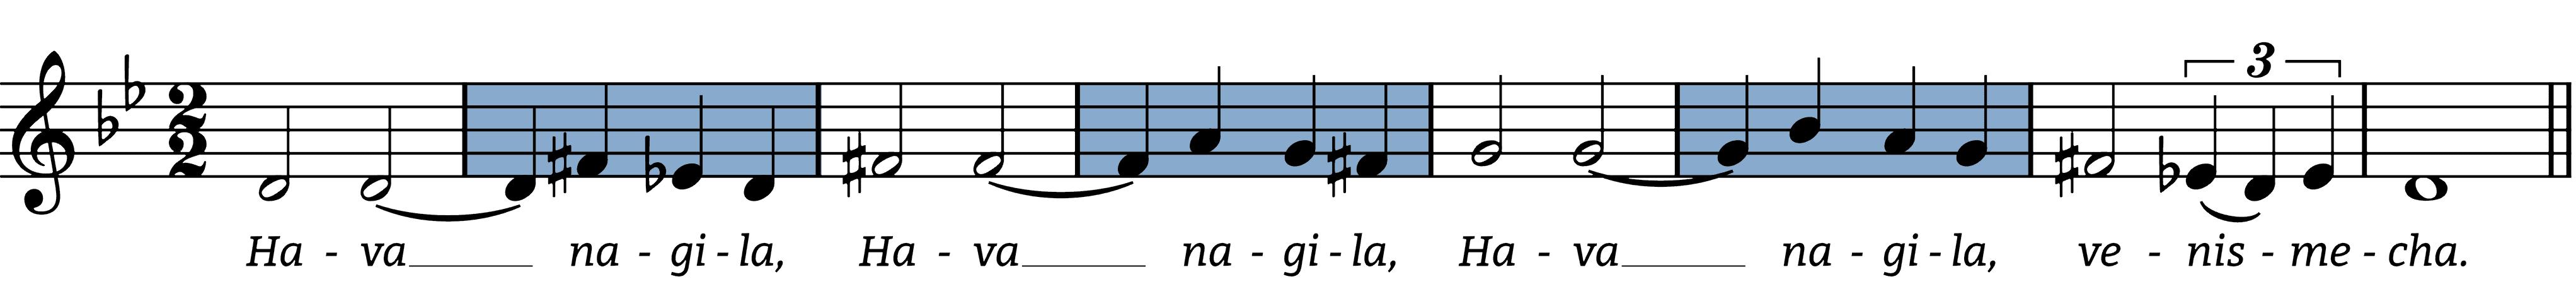 hava-nagila melodic figures